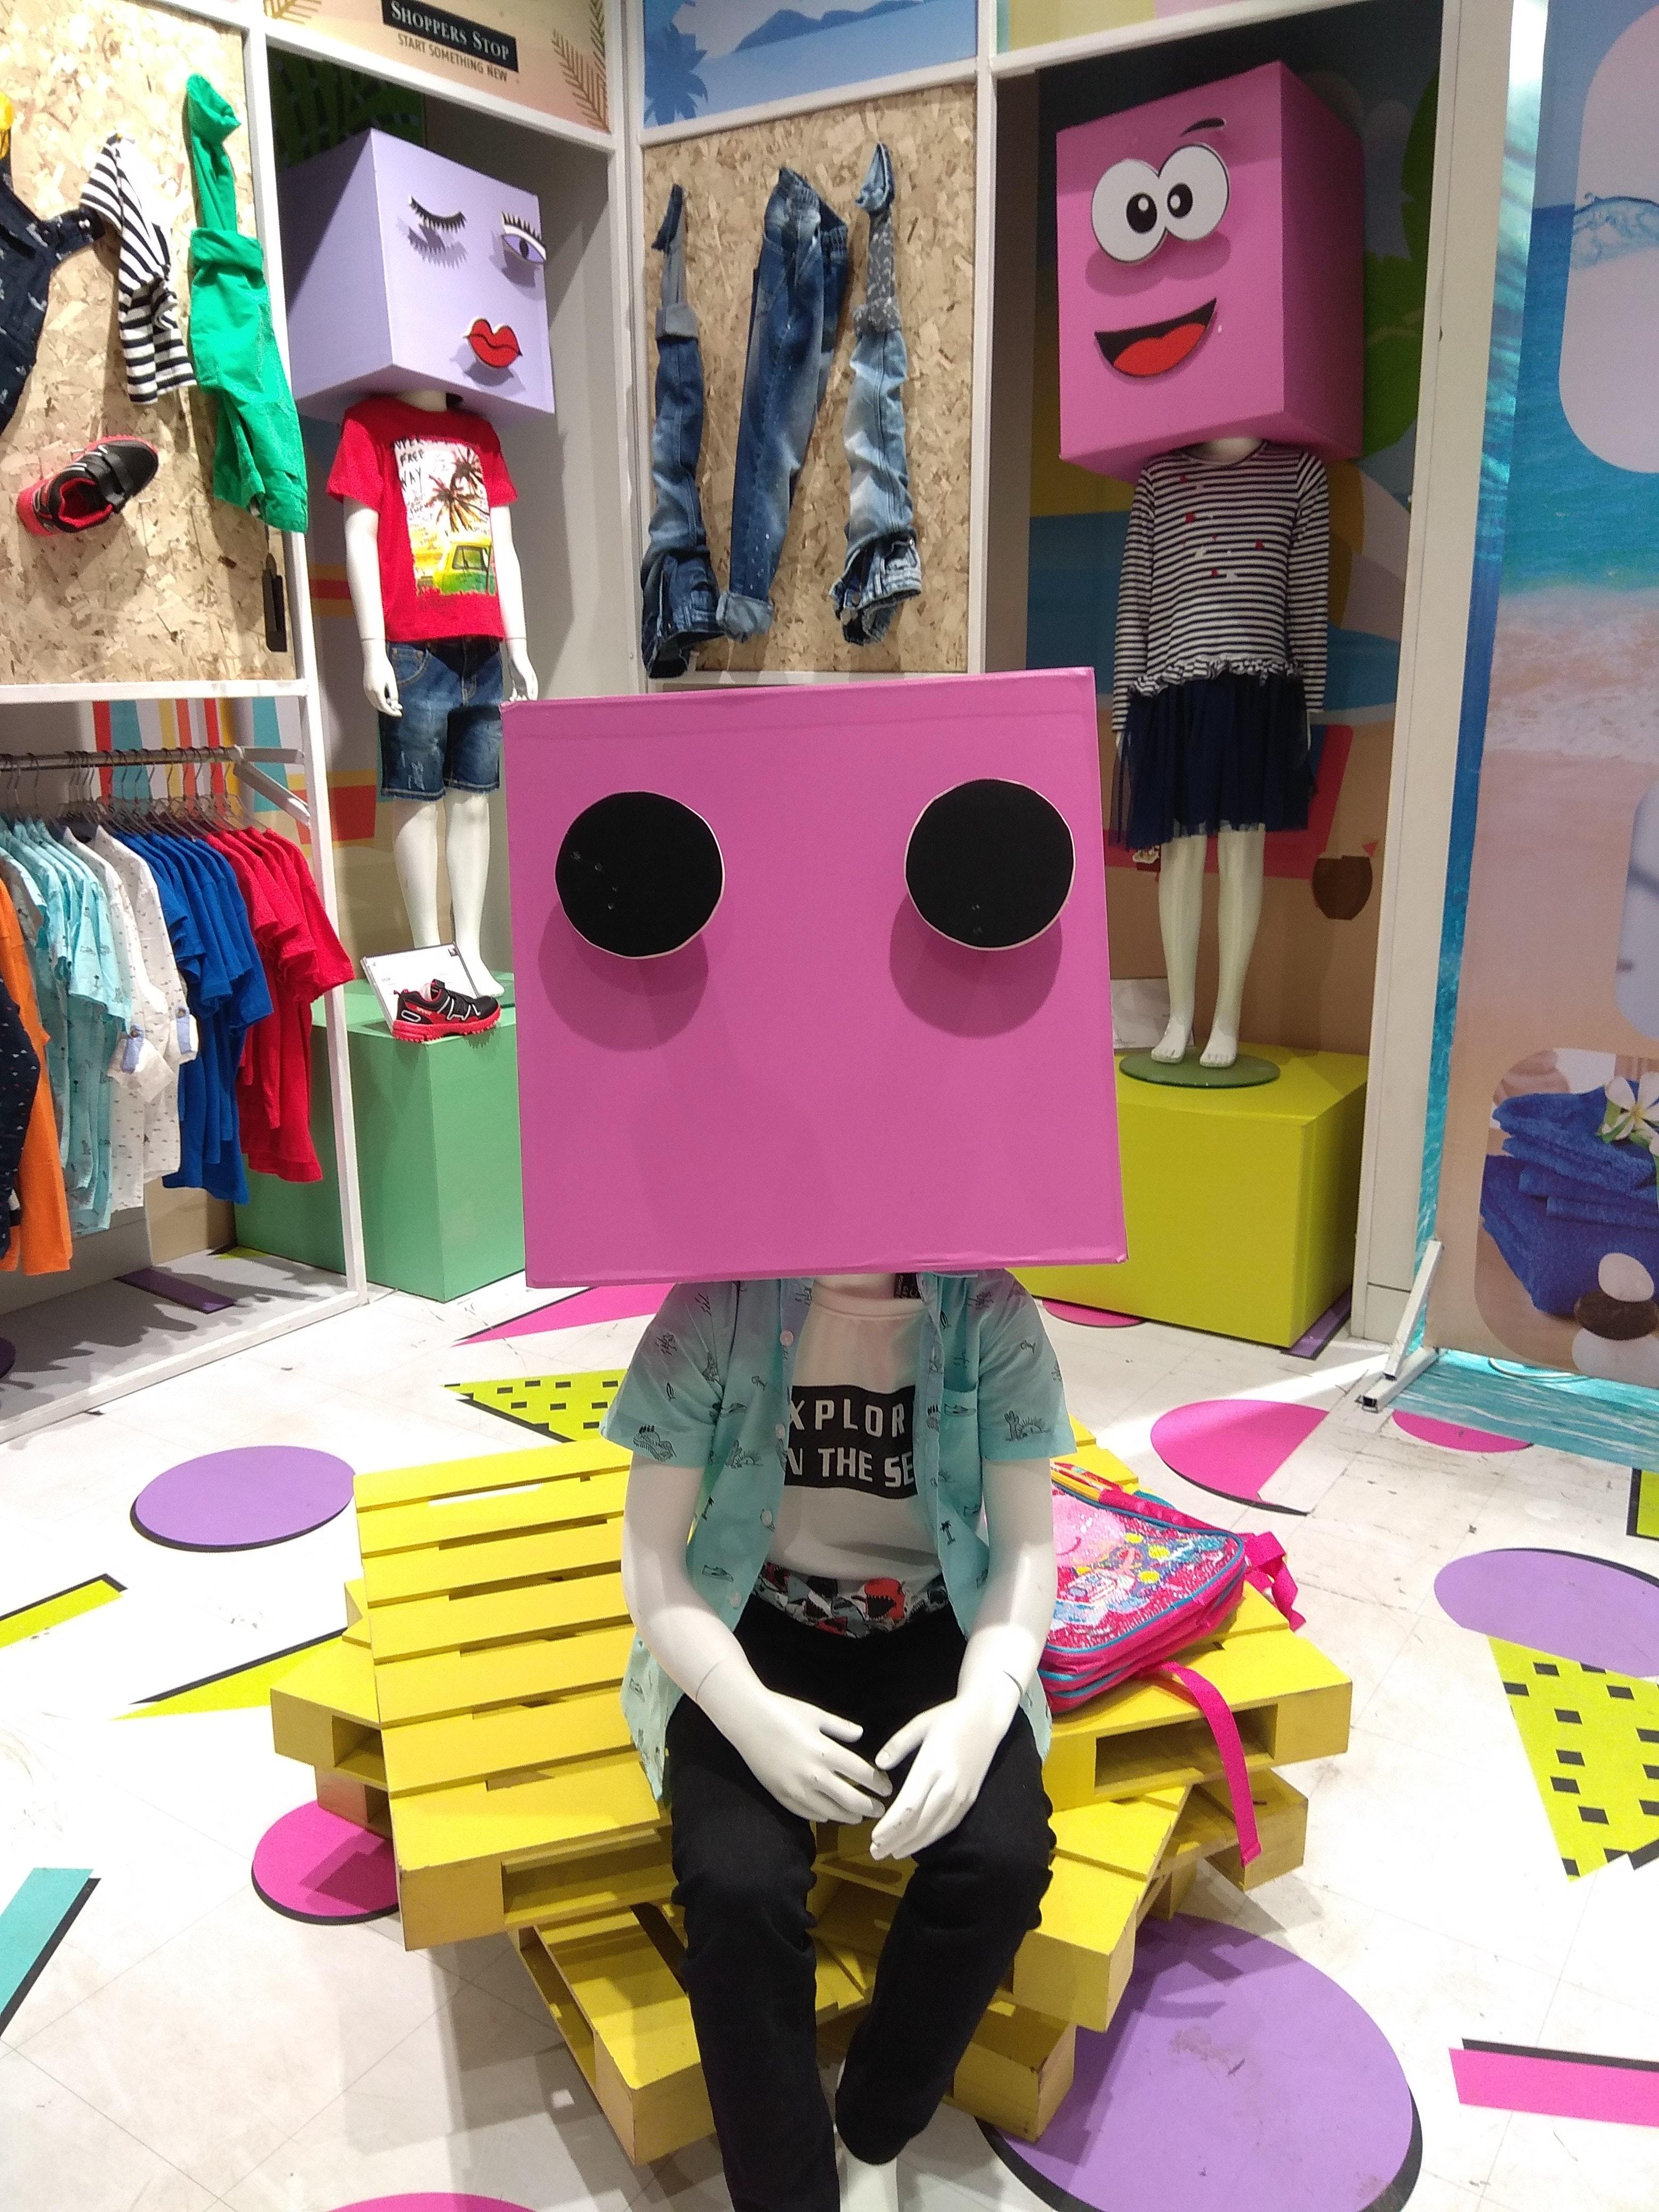 be60986384 bolso ropa ropa color vistoso grandes almacenes exposición Moda divertido  colgando adentro dentro Niños estilo de